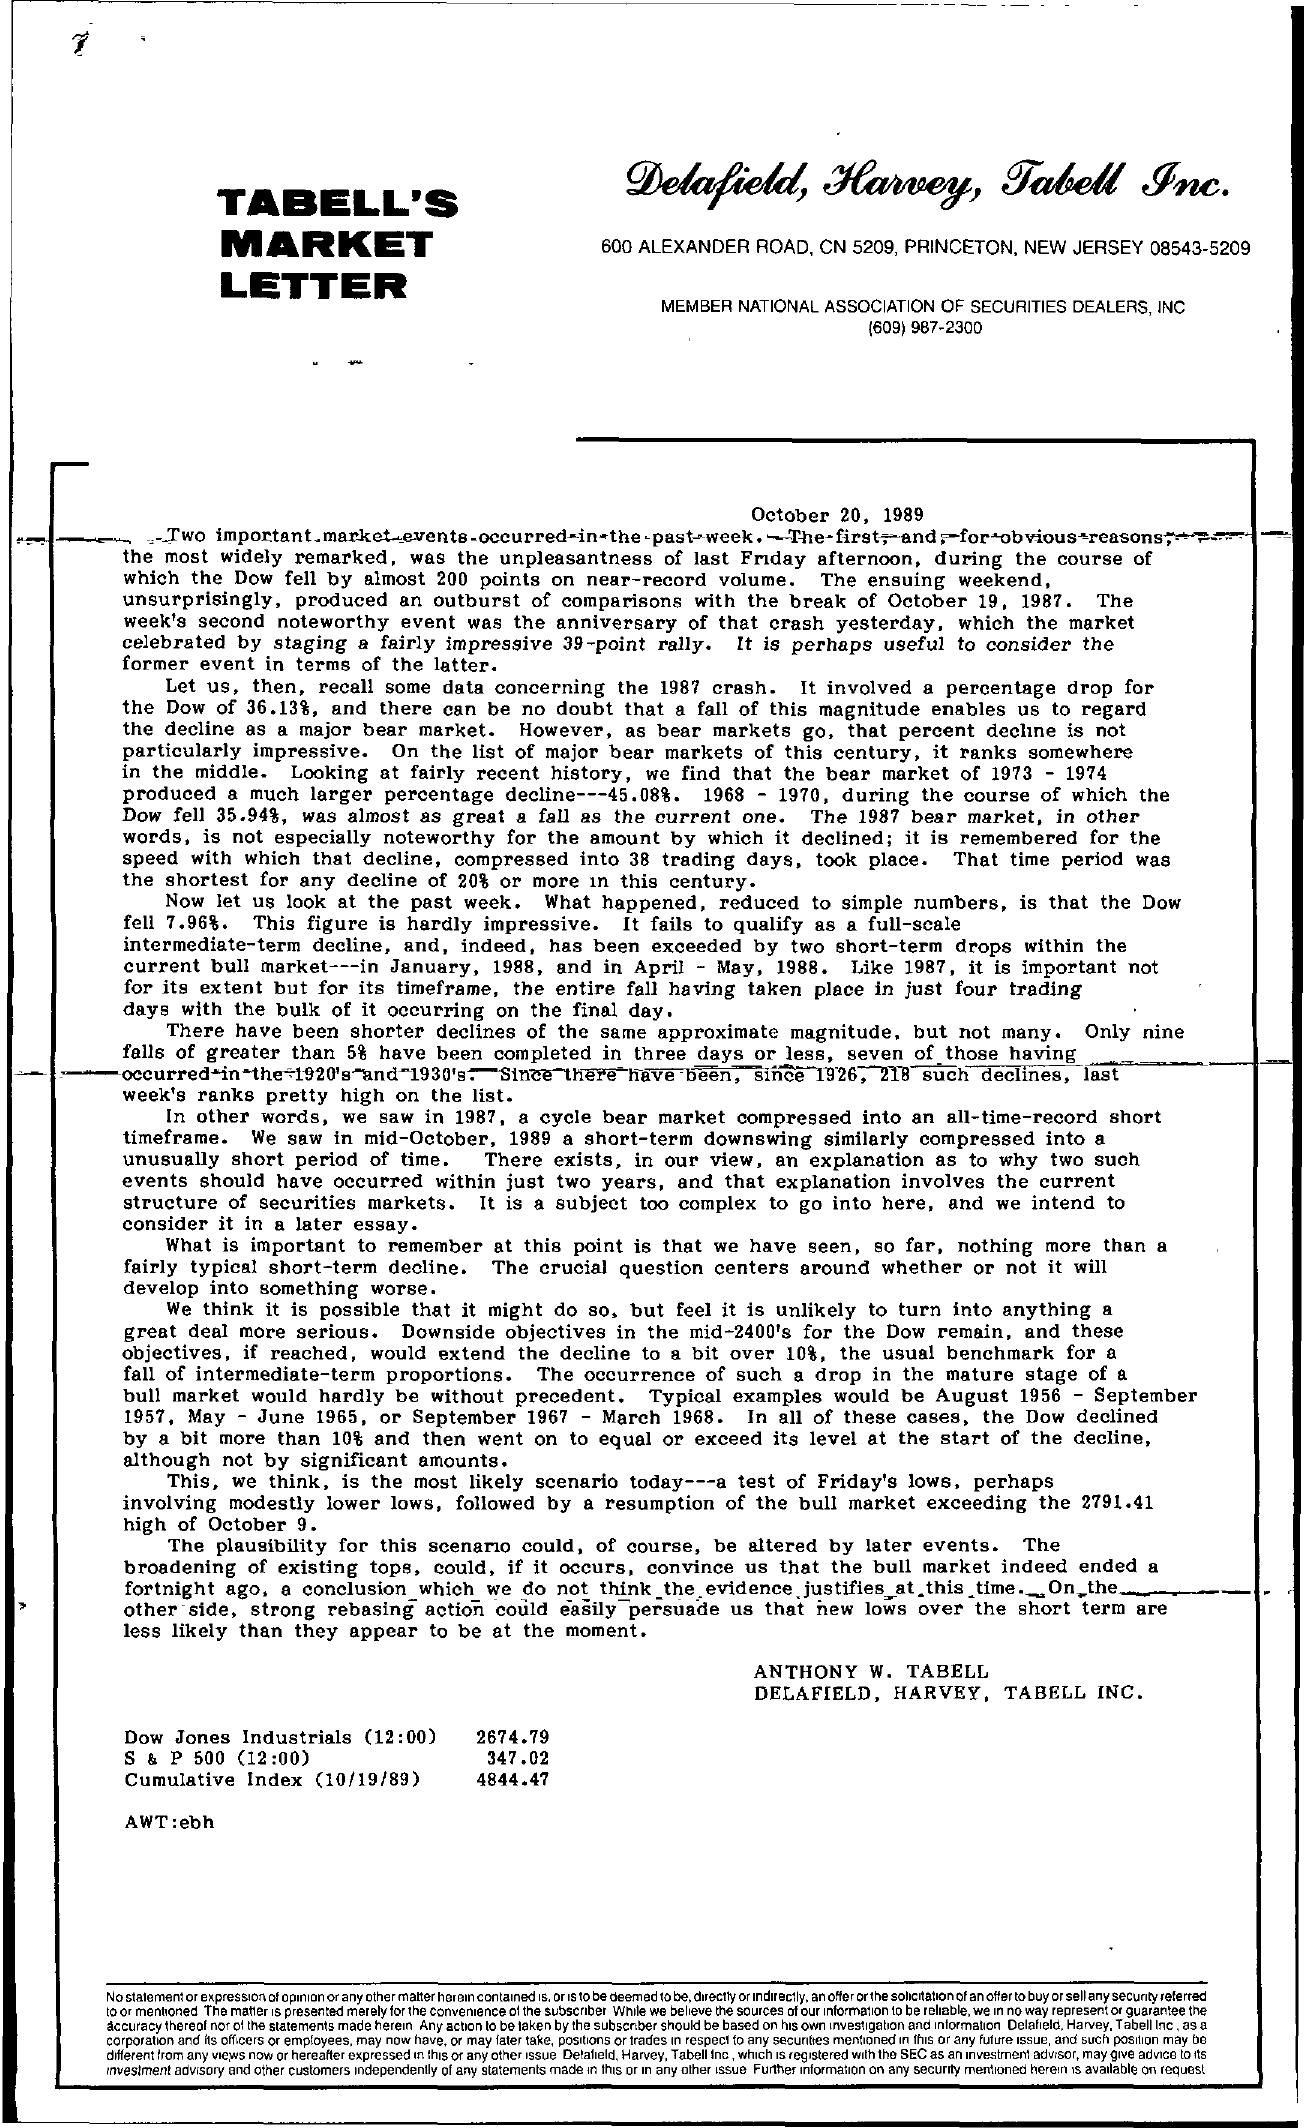 Tabell's Market Letter - October 20, 1989